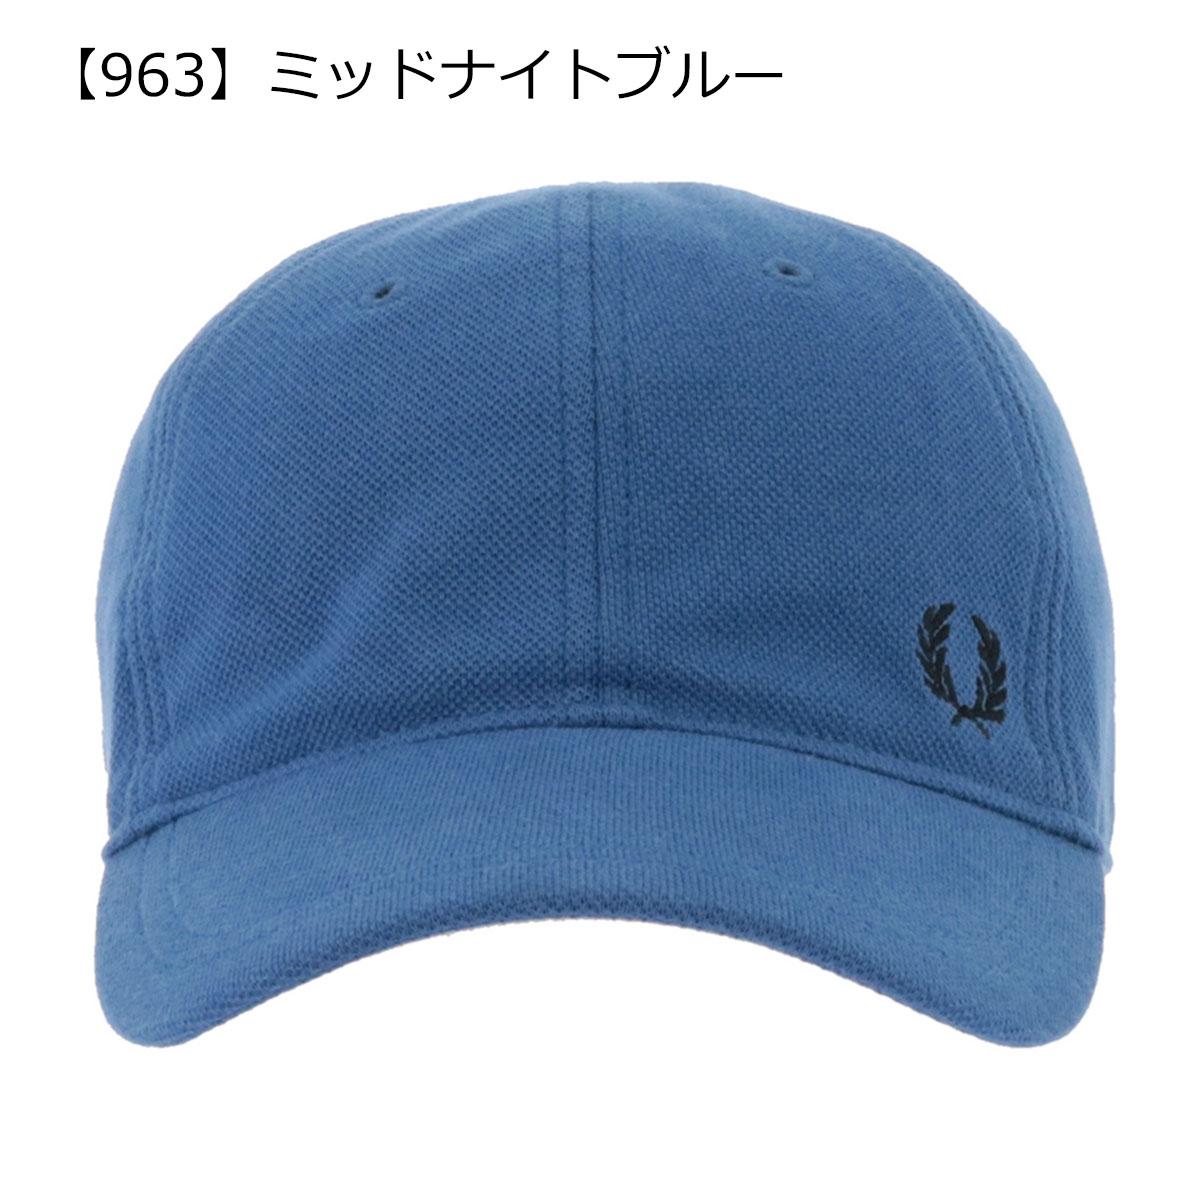 【F81】スカイブルー